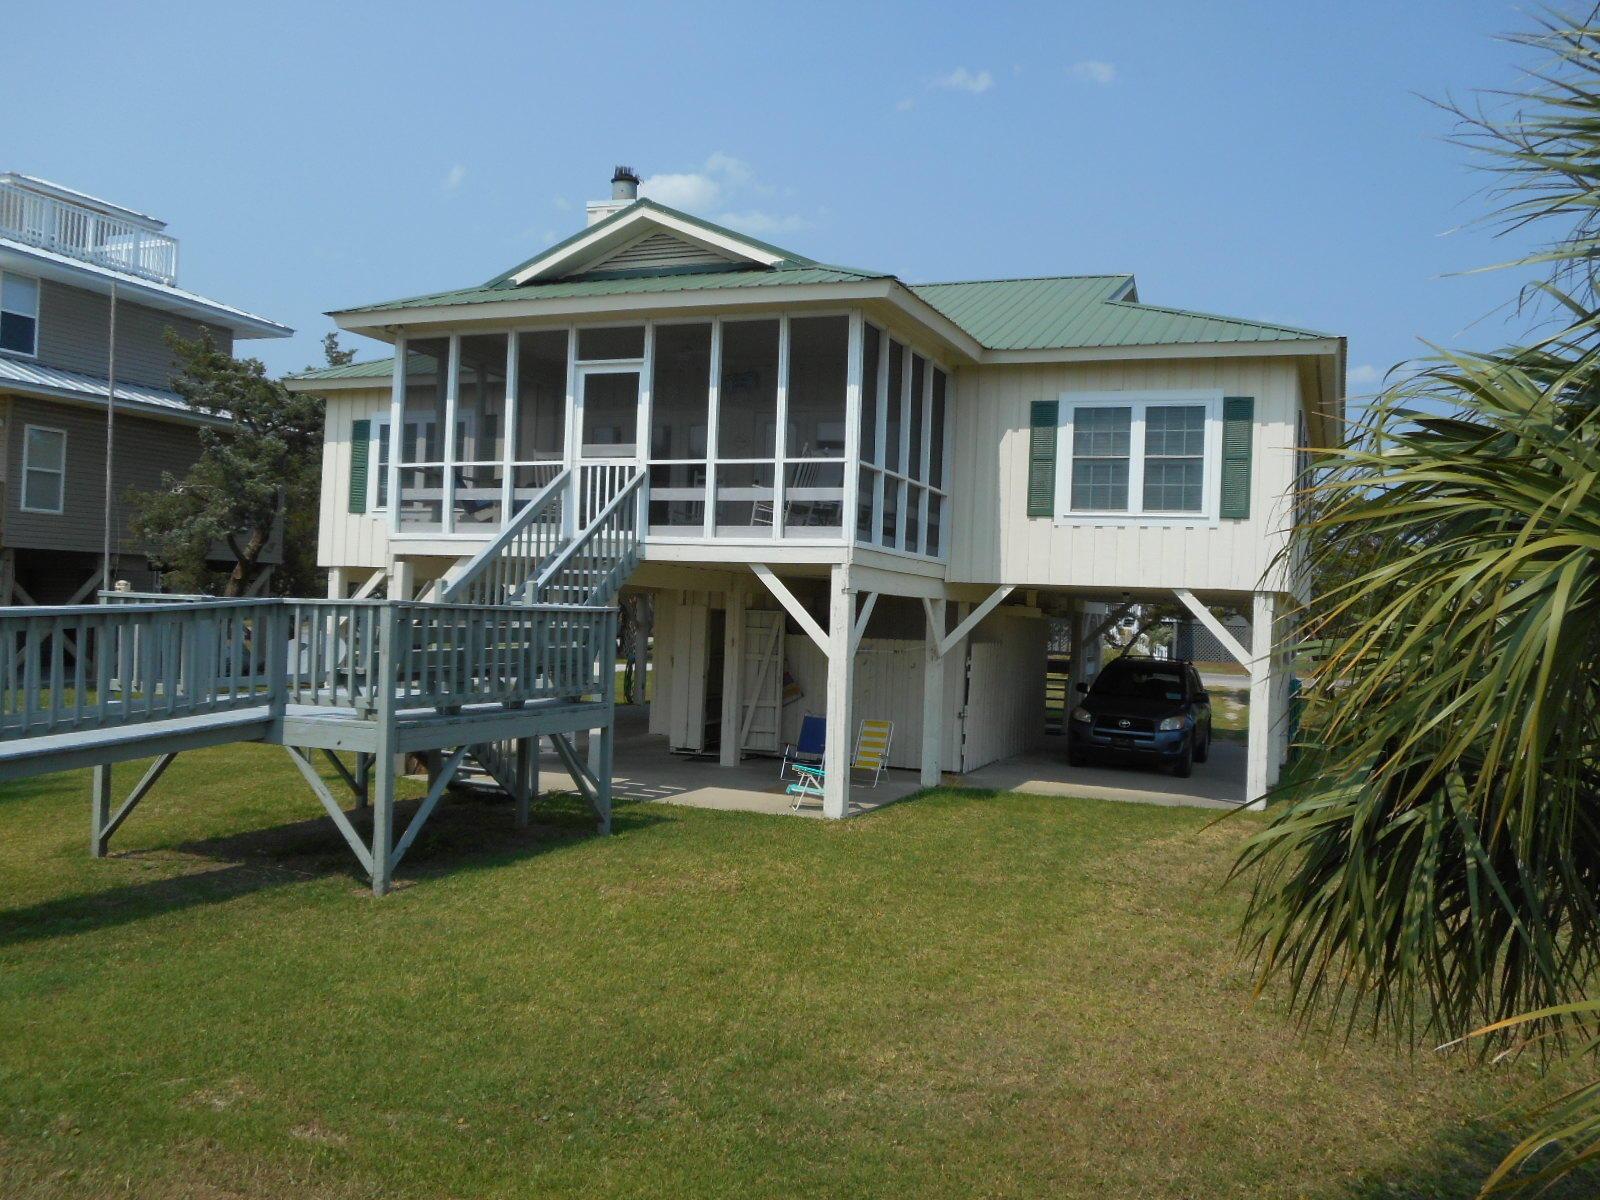 Beachfront Homes For Sale - 3608 Yacht Club, Edisto Beach, SC - 6